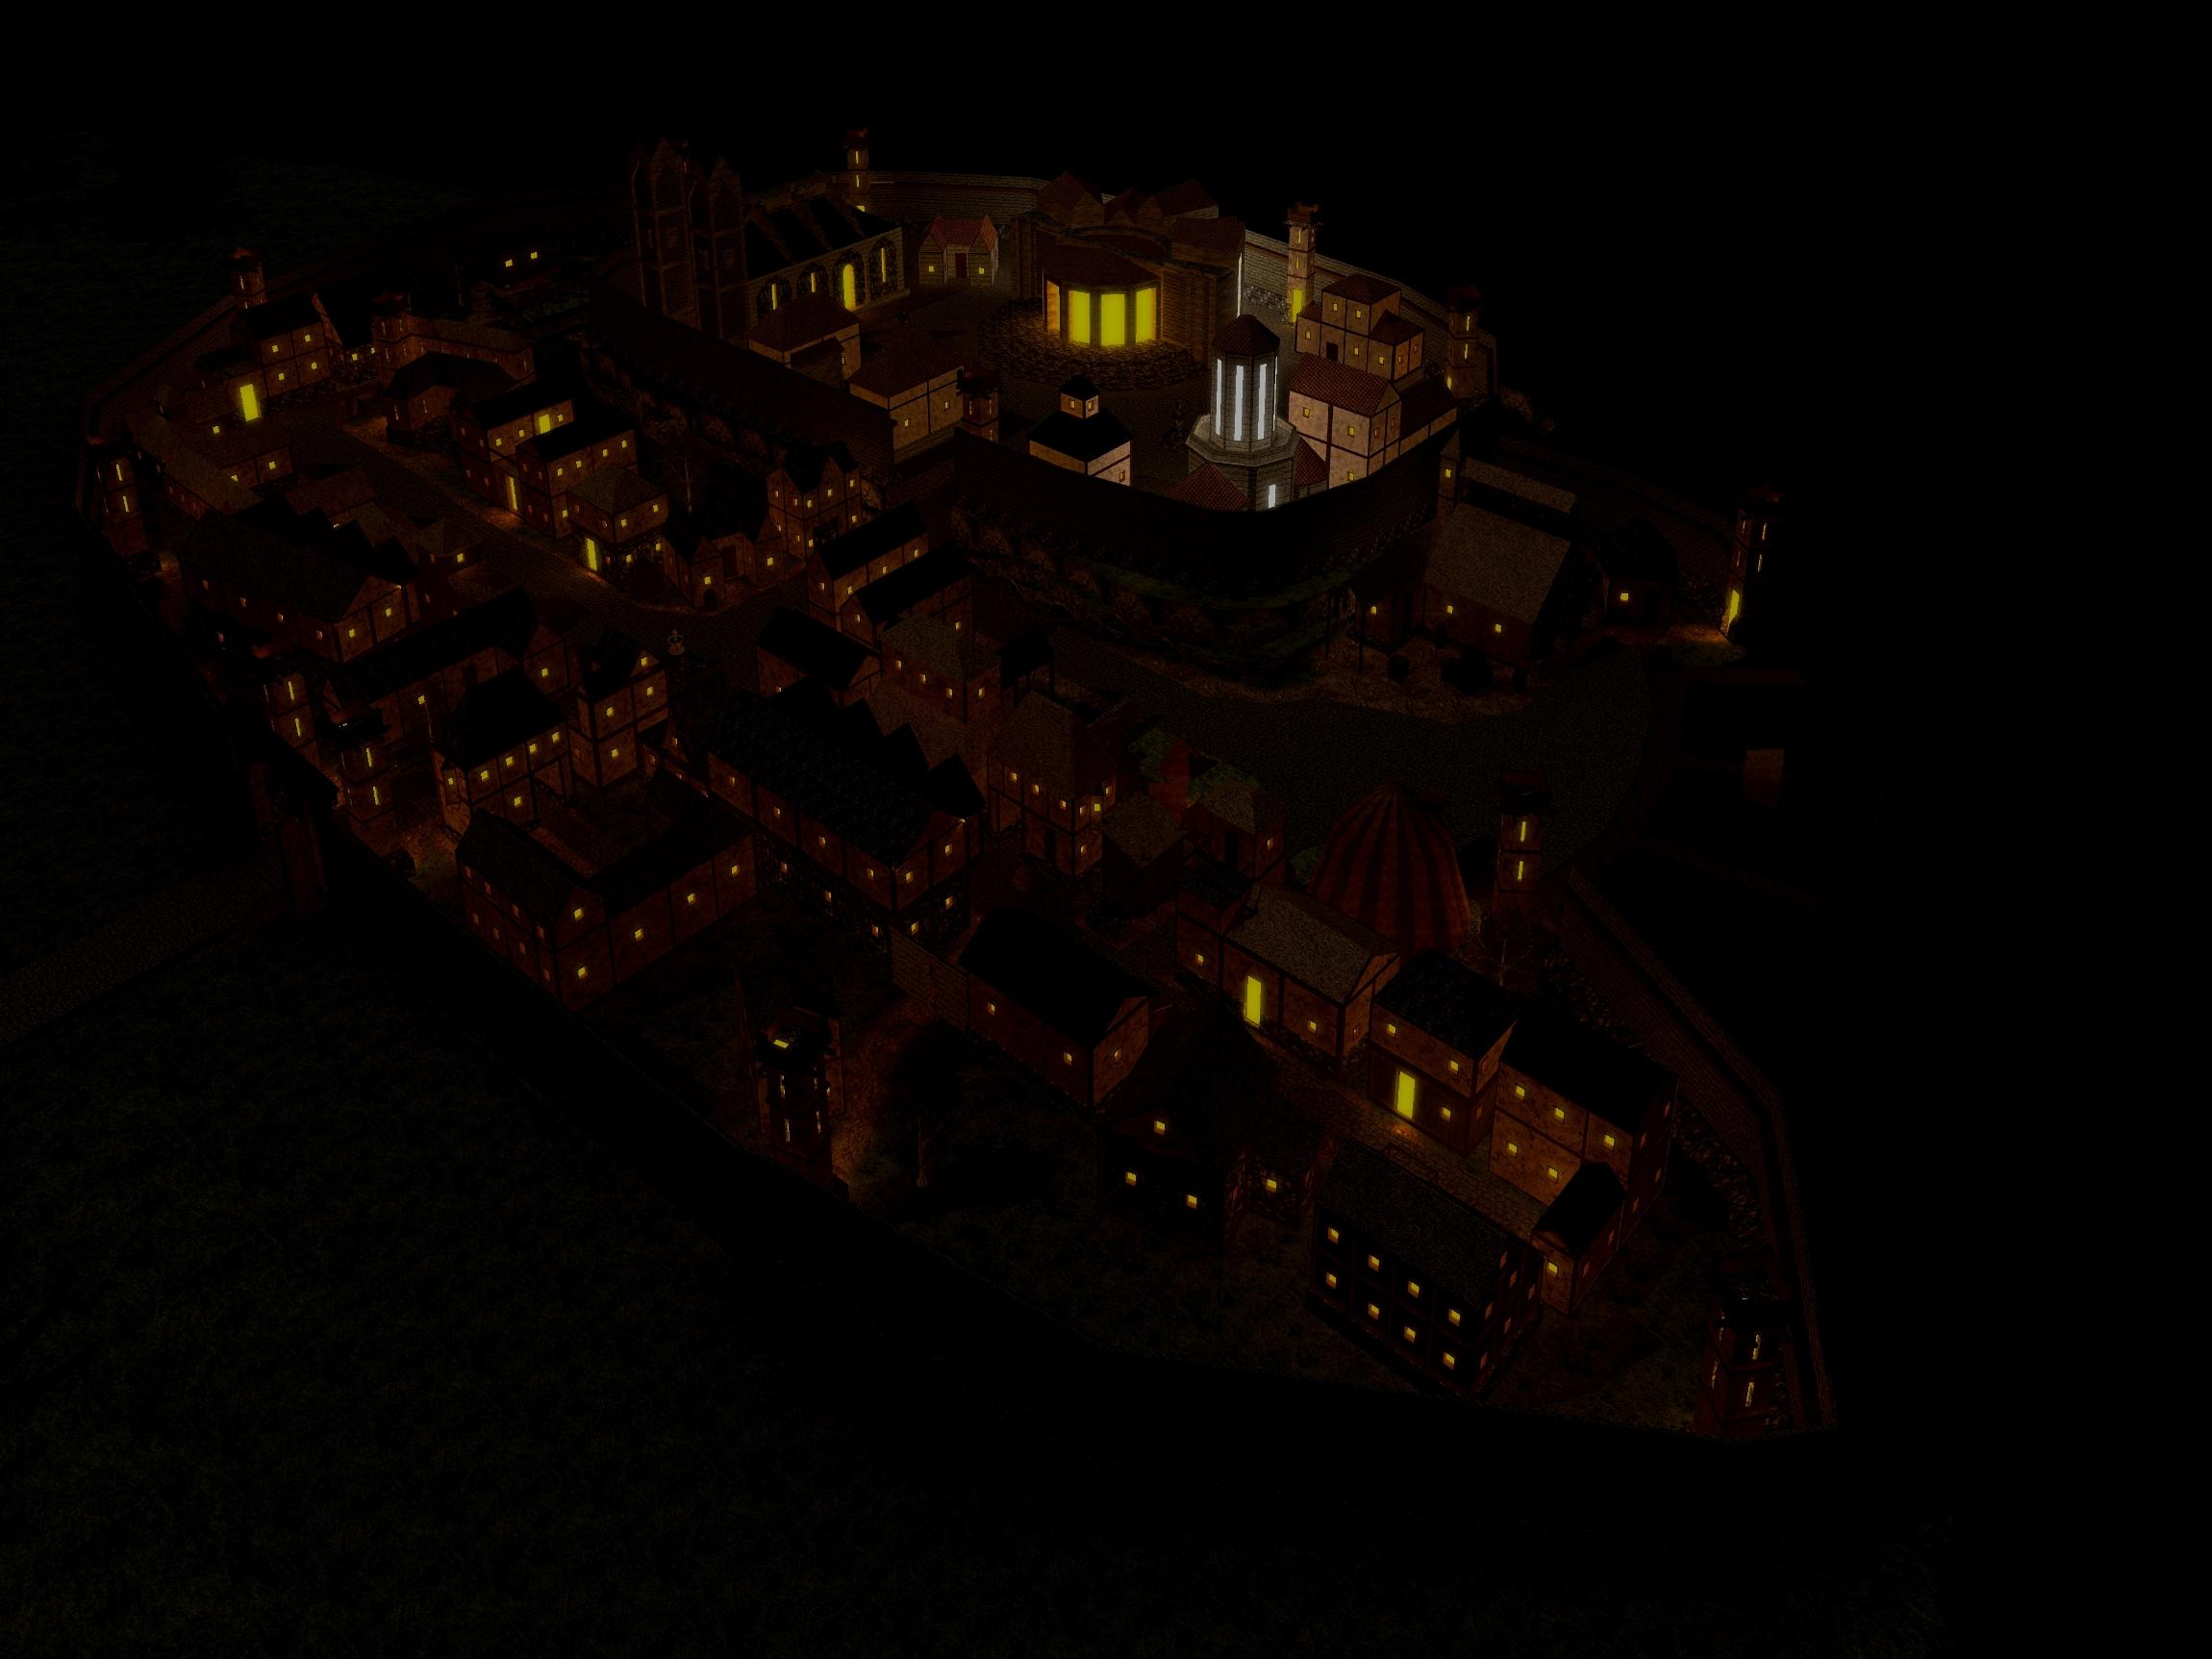 Medieval City at Night